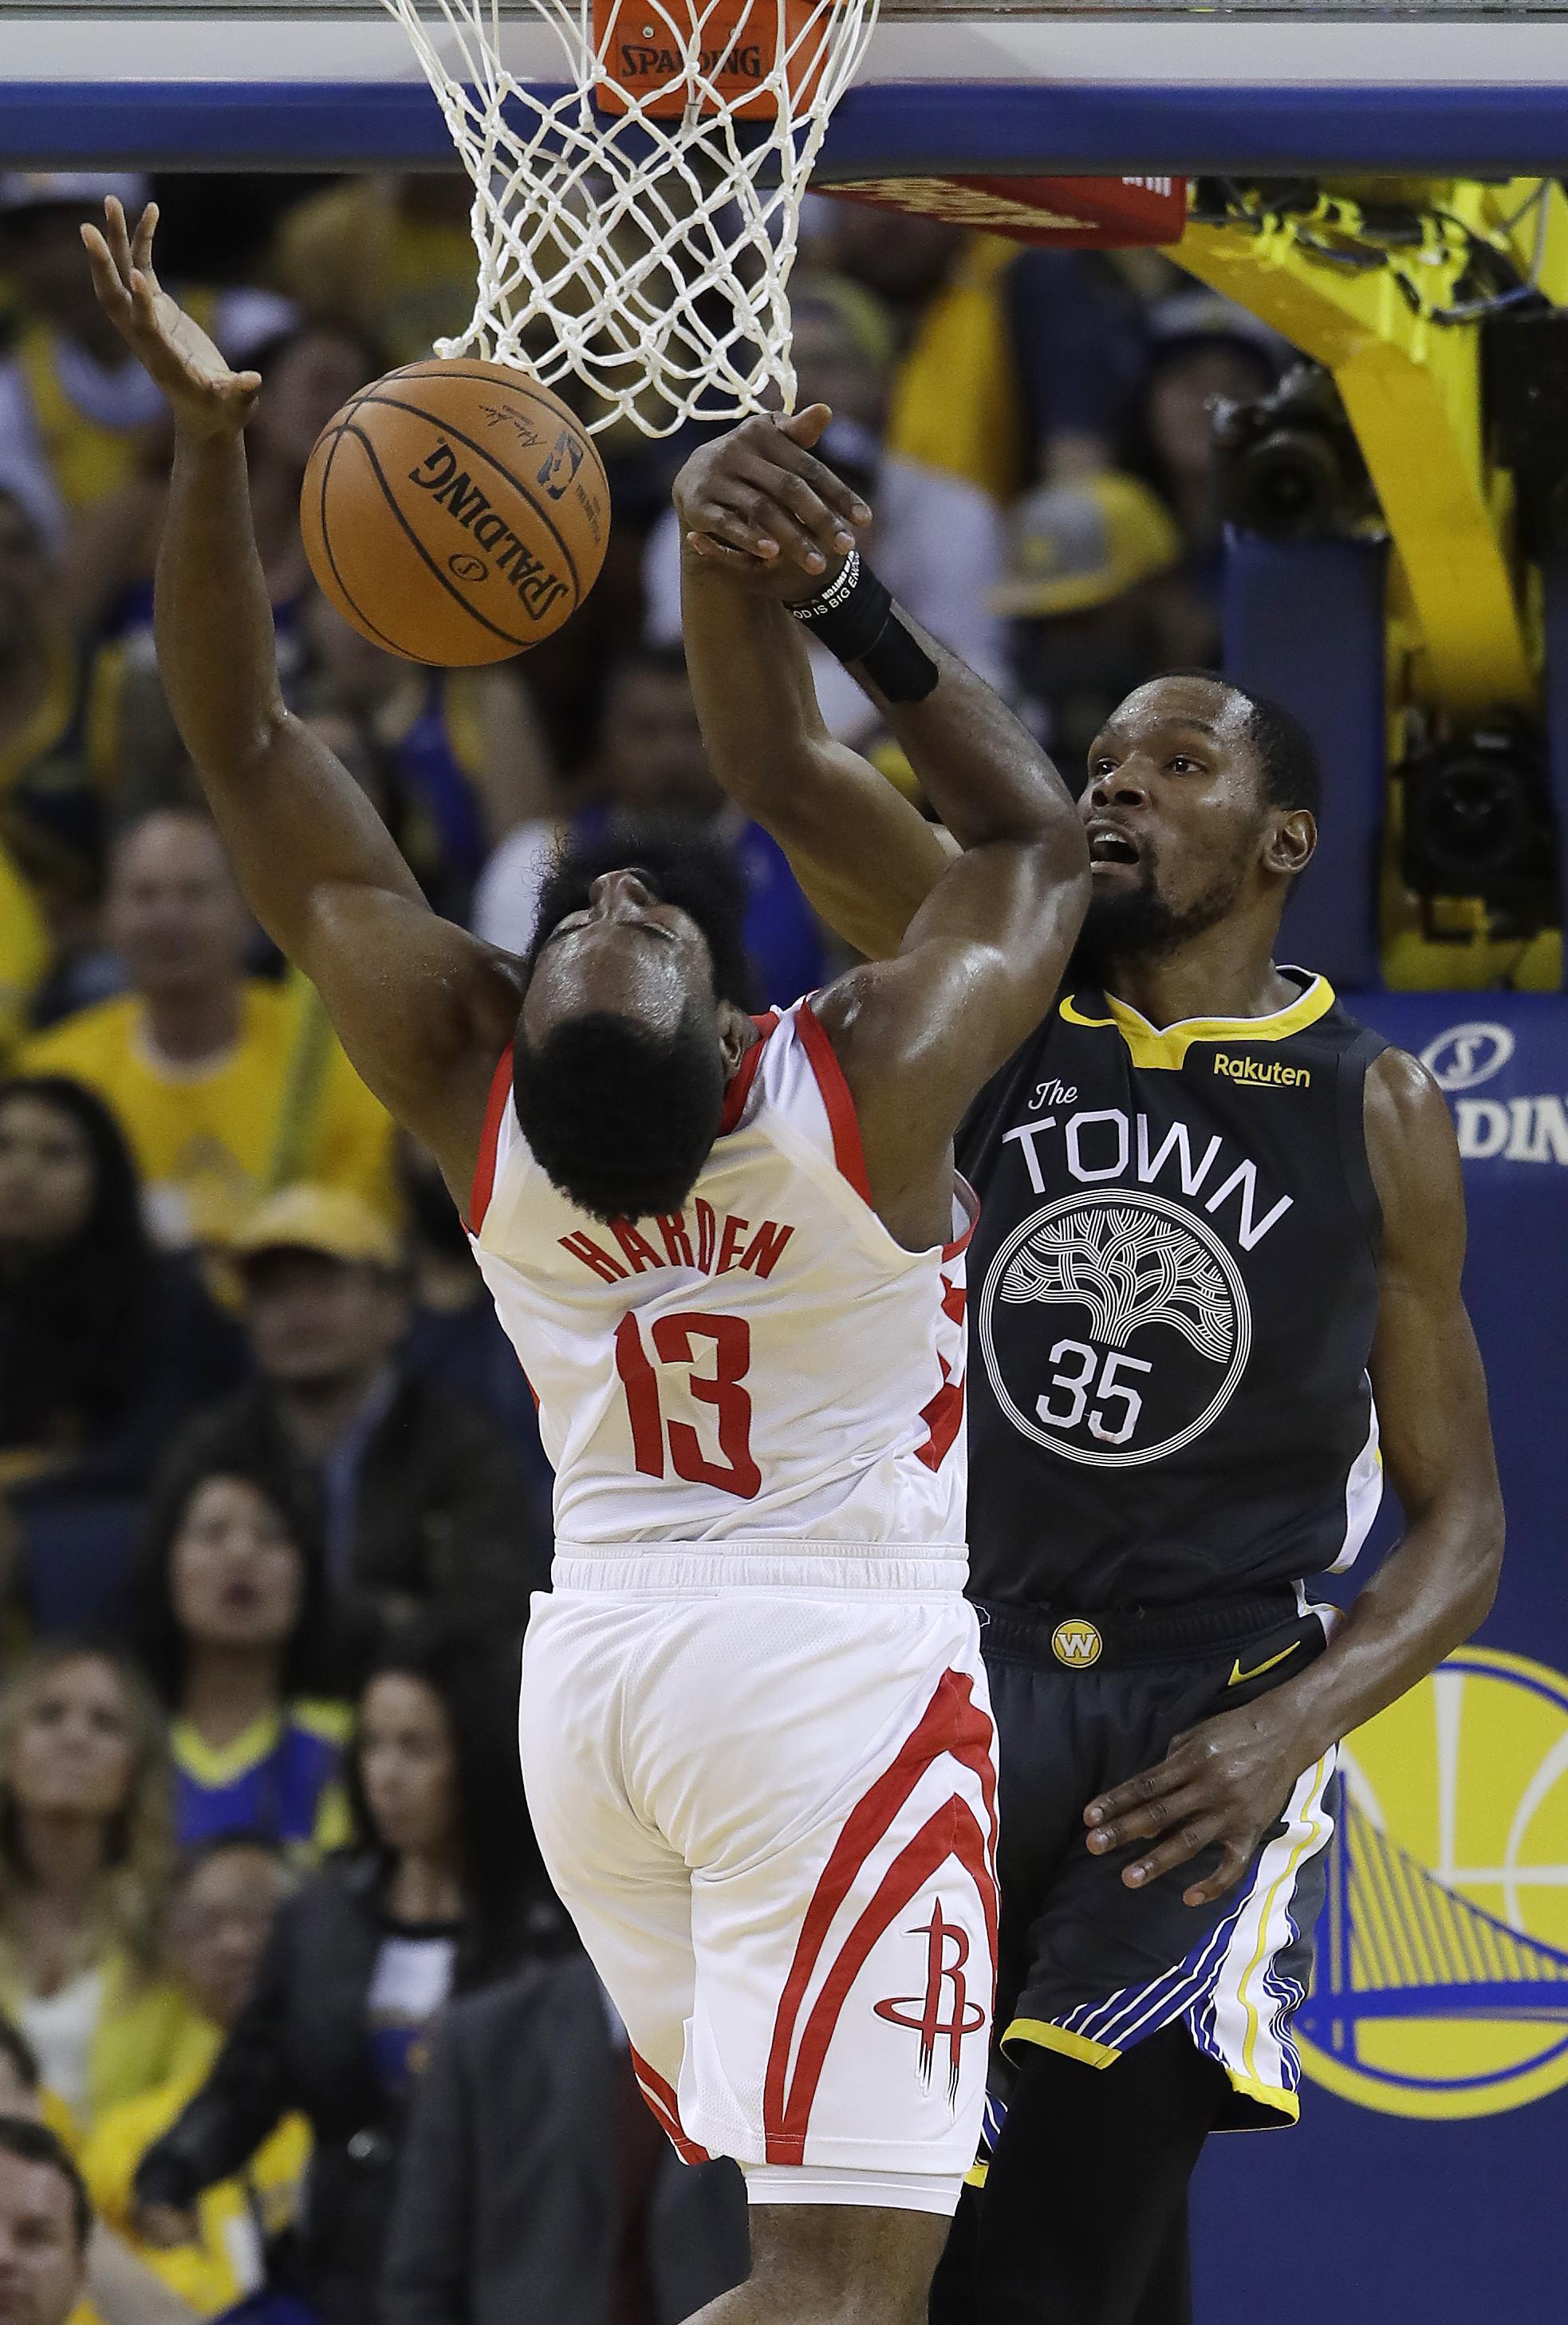 c21a39c26811 Warriors-Rockets has championship feel - Washington Times